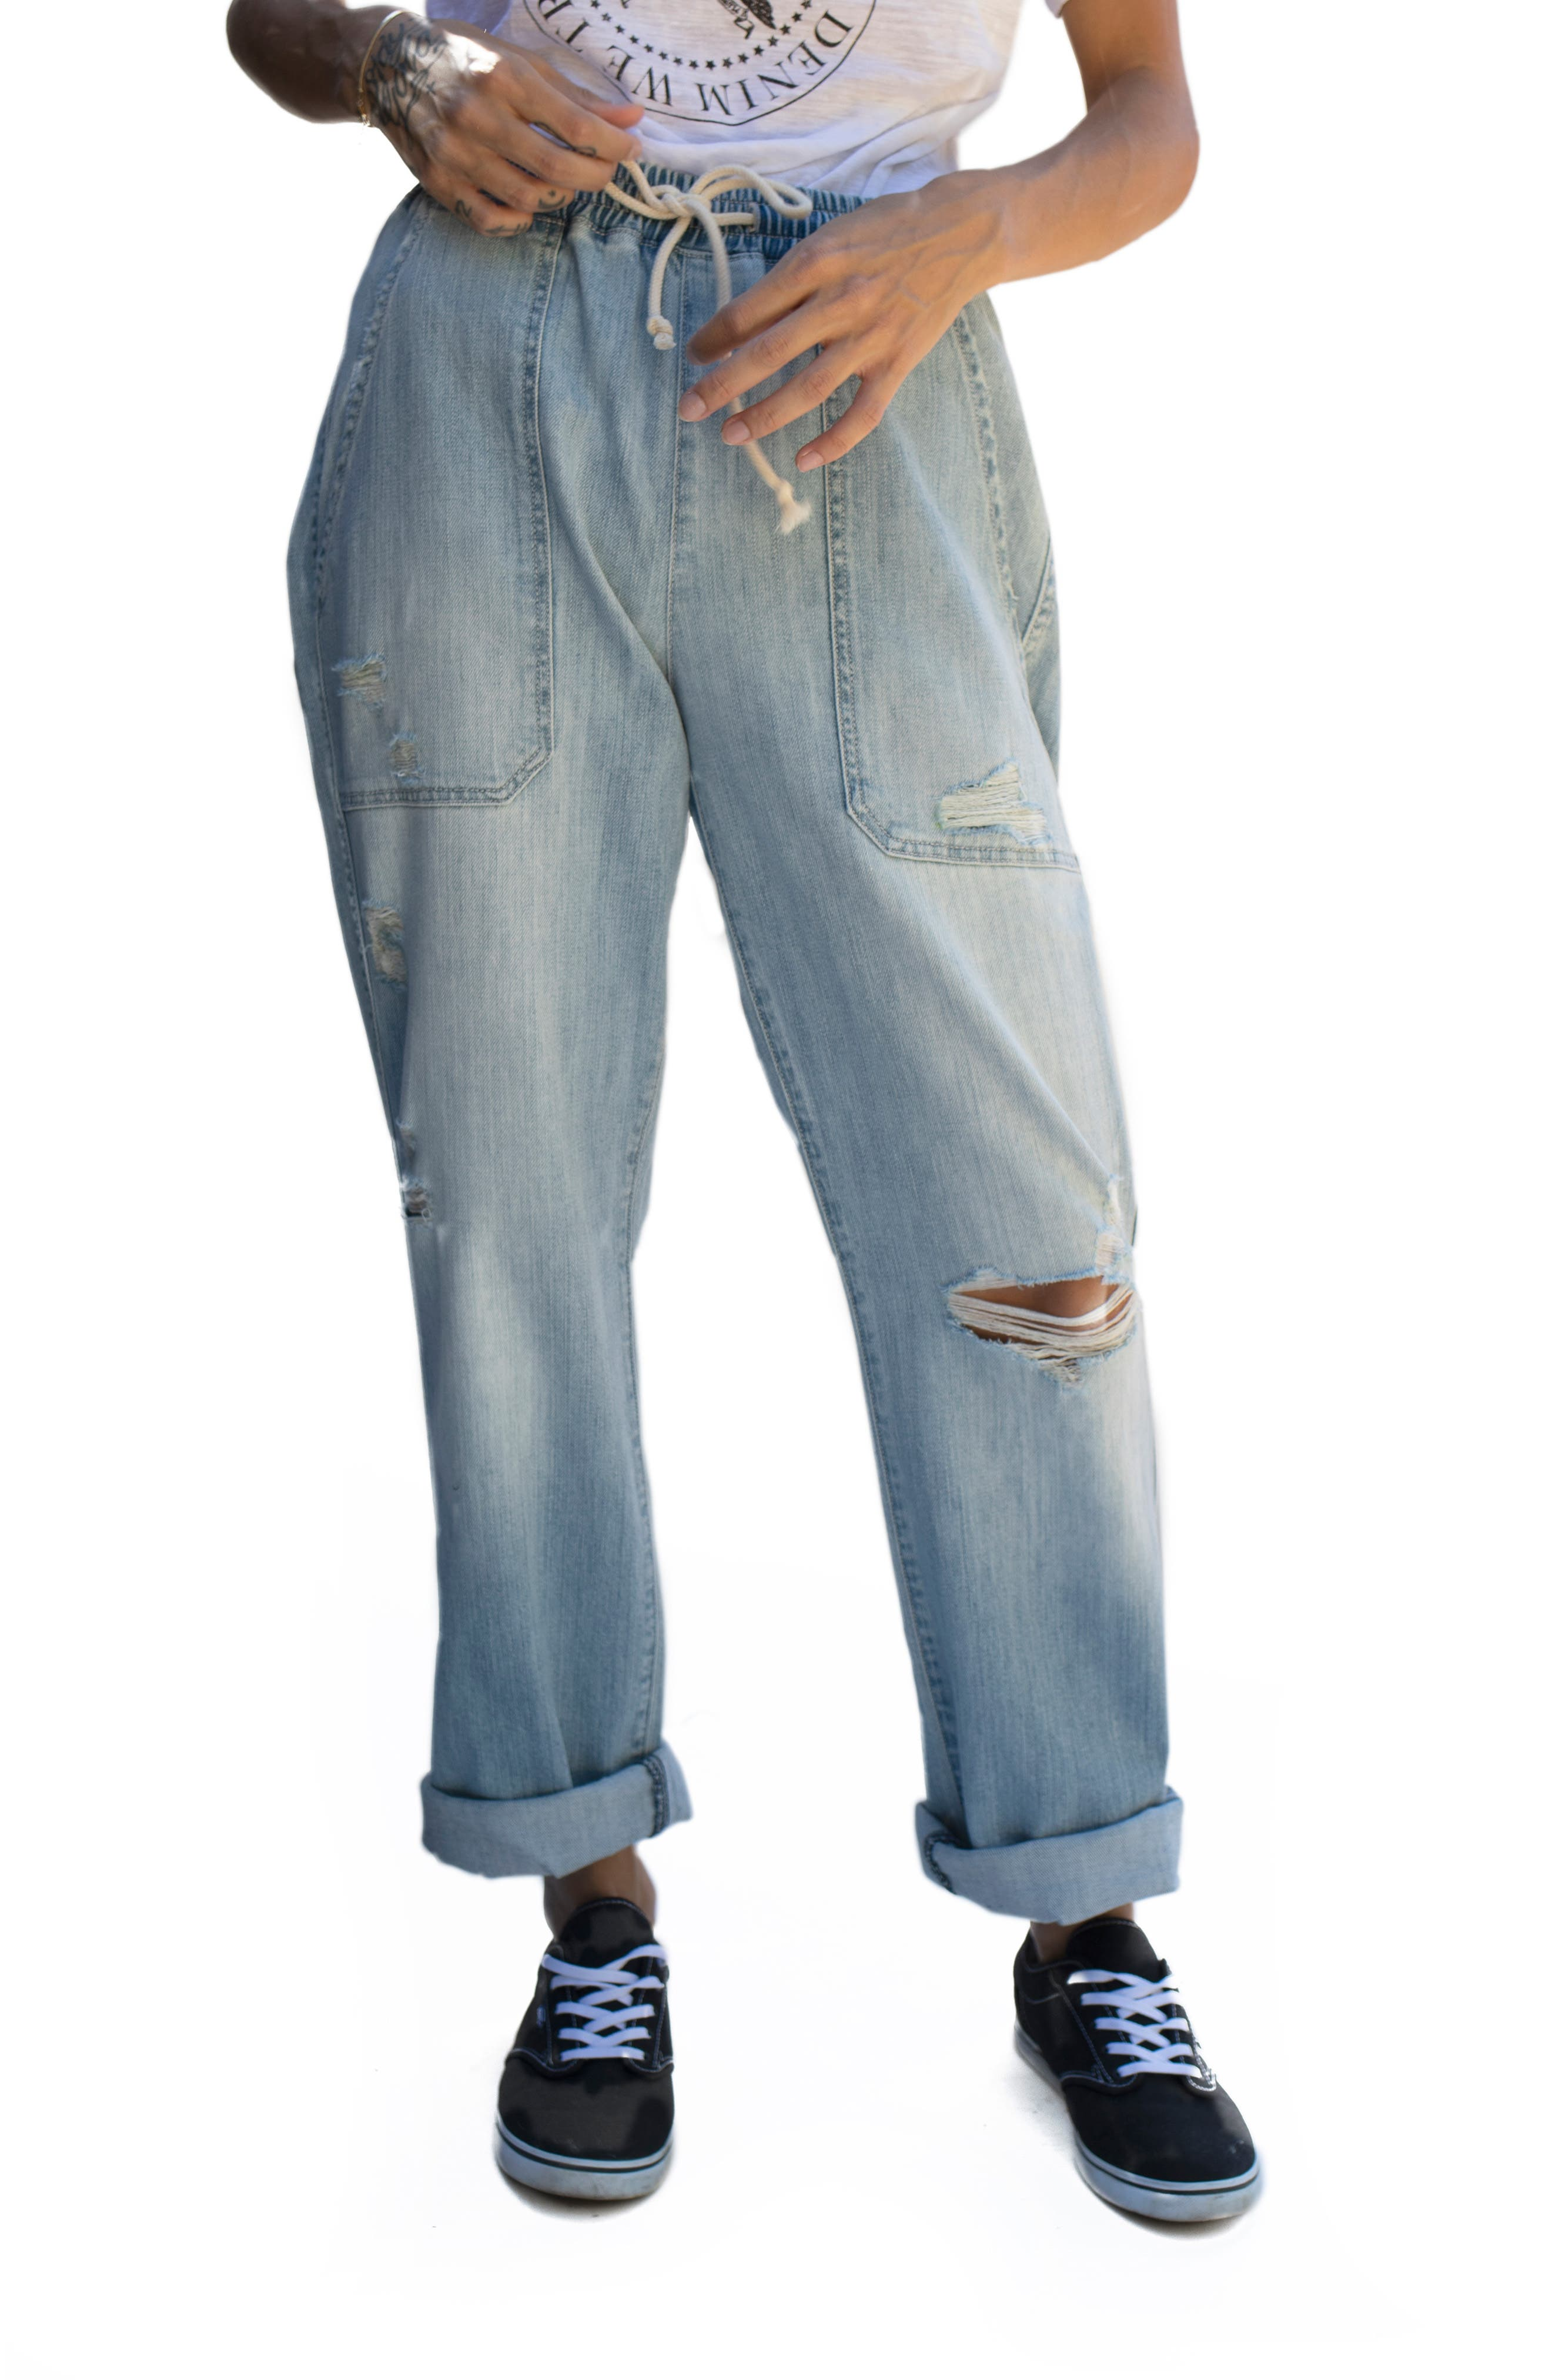 Women's Fidelity Jasper High Waist Ripped Jogger Jeans